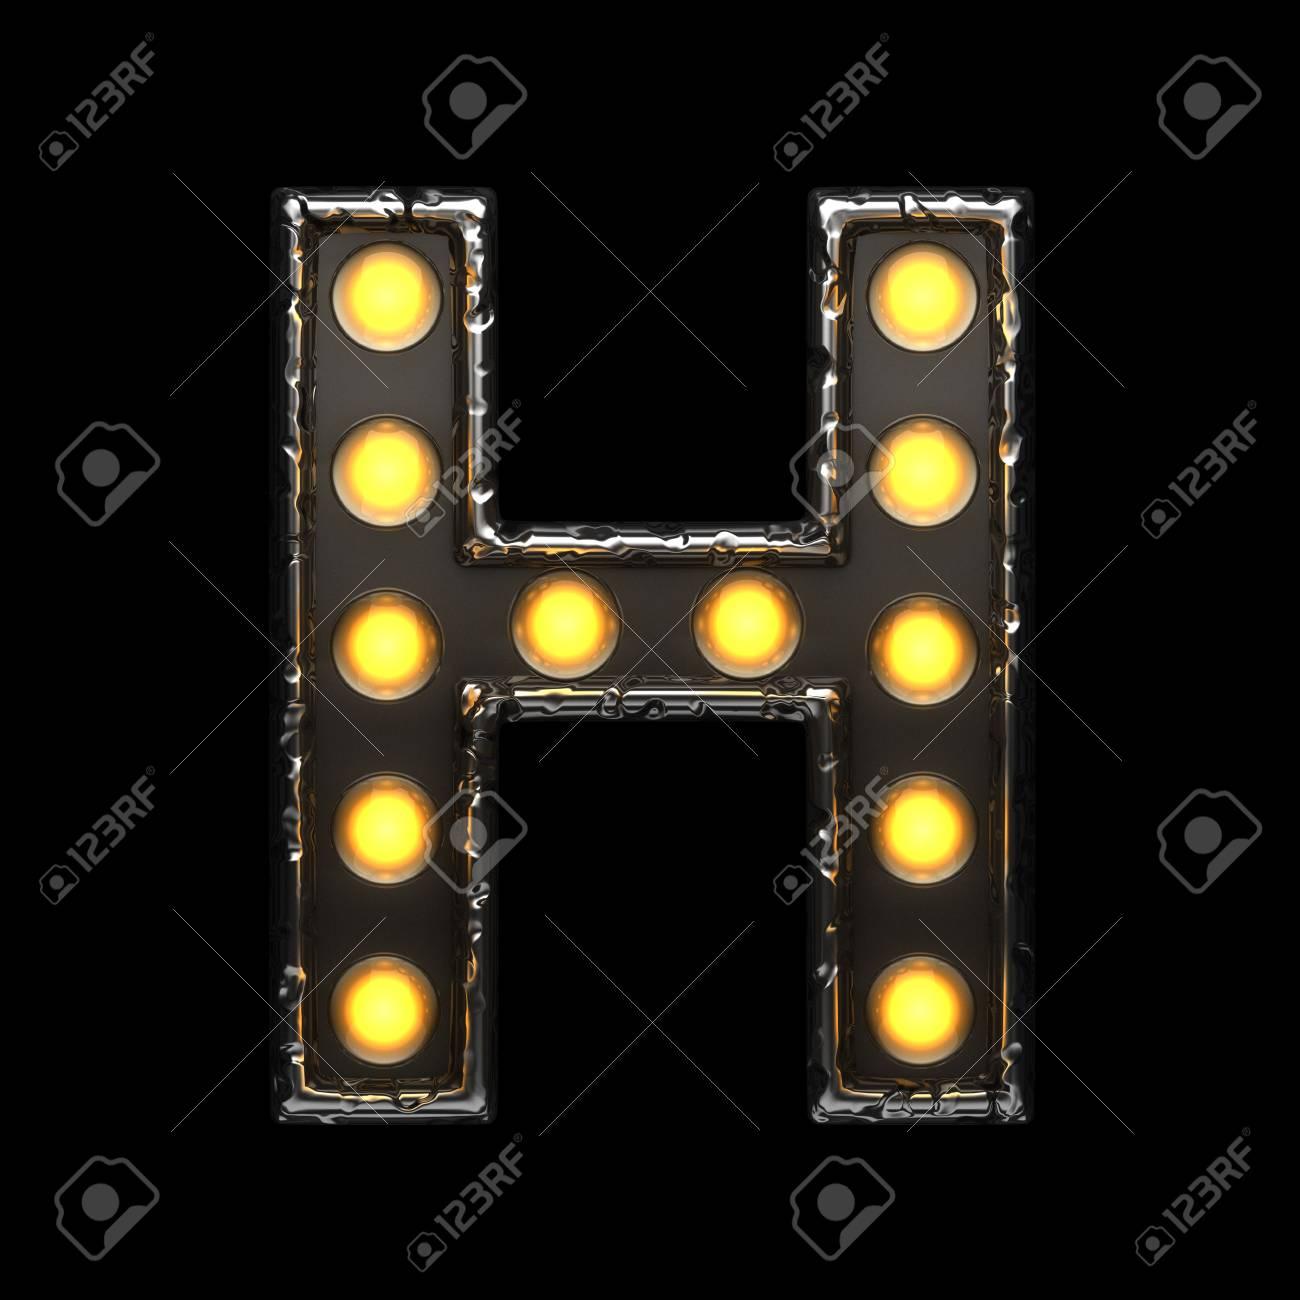 https://previews.123rf.com/images/videodoctor/videodoctor1608/videodoctor160800055/62091715-h-metalen-letter-met-verlichting-3d-illustratie.jpg